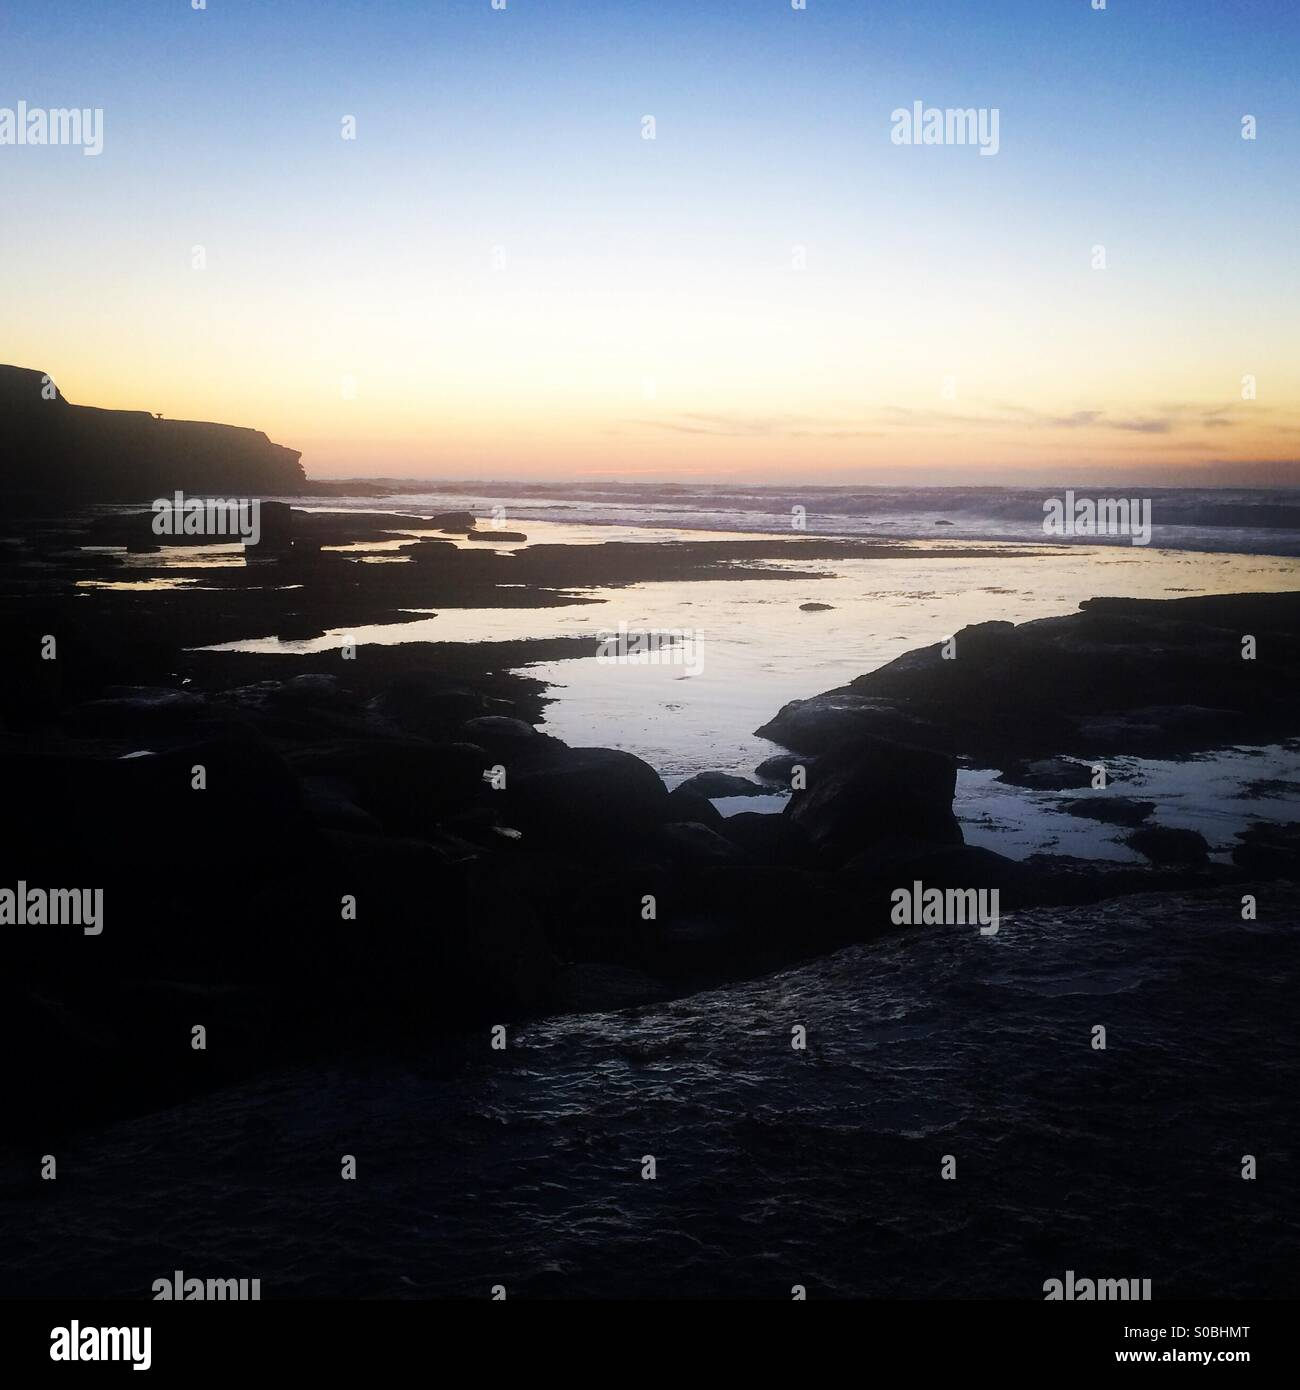 The sunset peaks - Stock Image